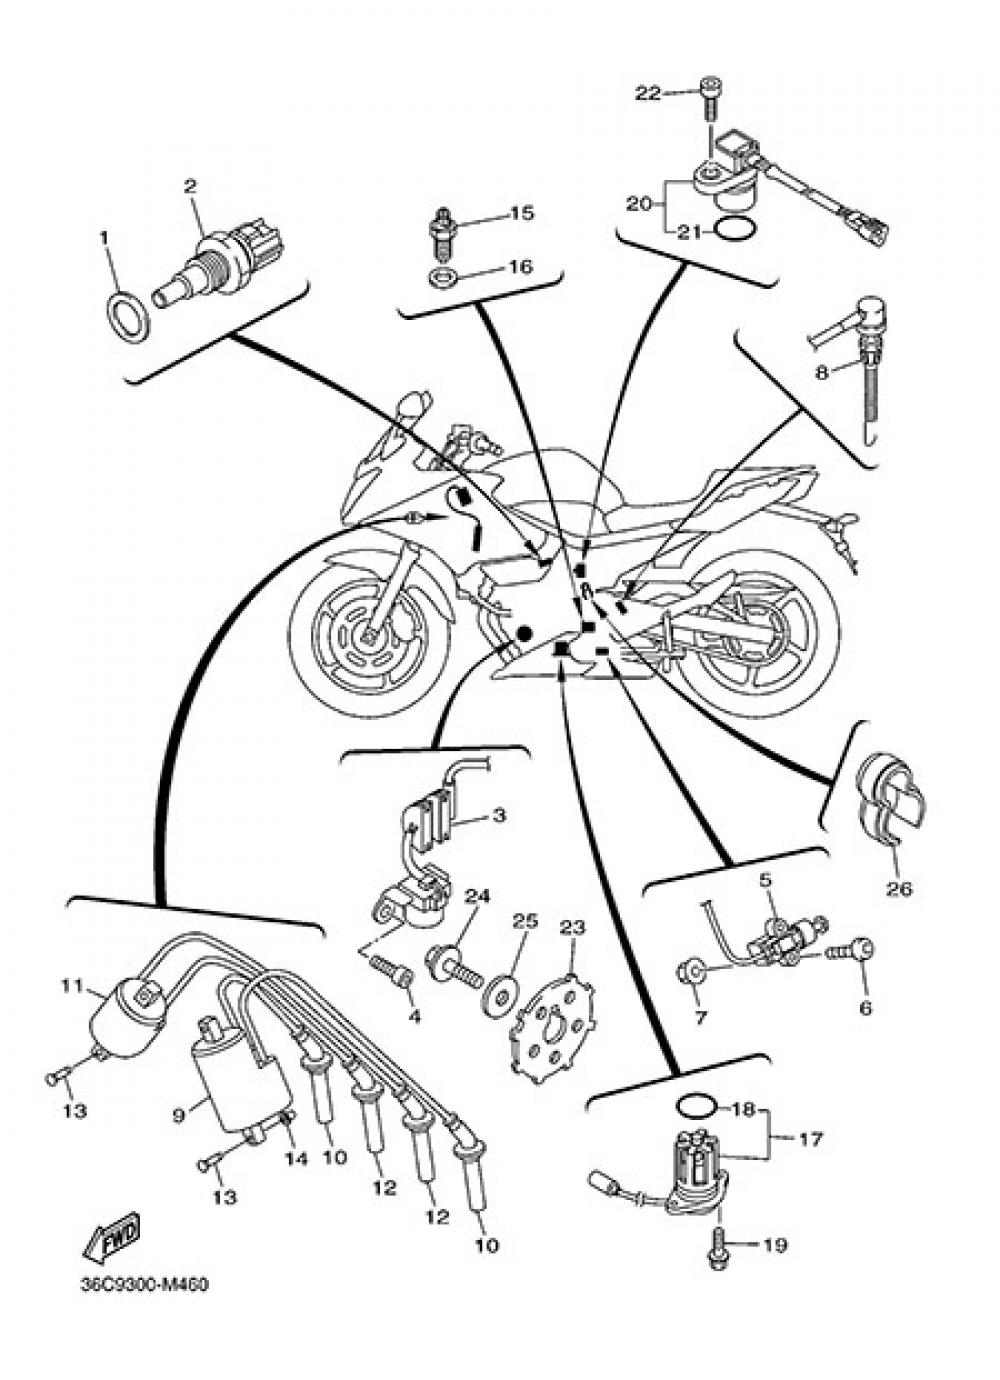 ELECTRIC EQUIPMENT 1 Yamaha XJ6 Diversion 2014